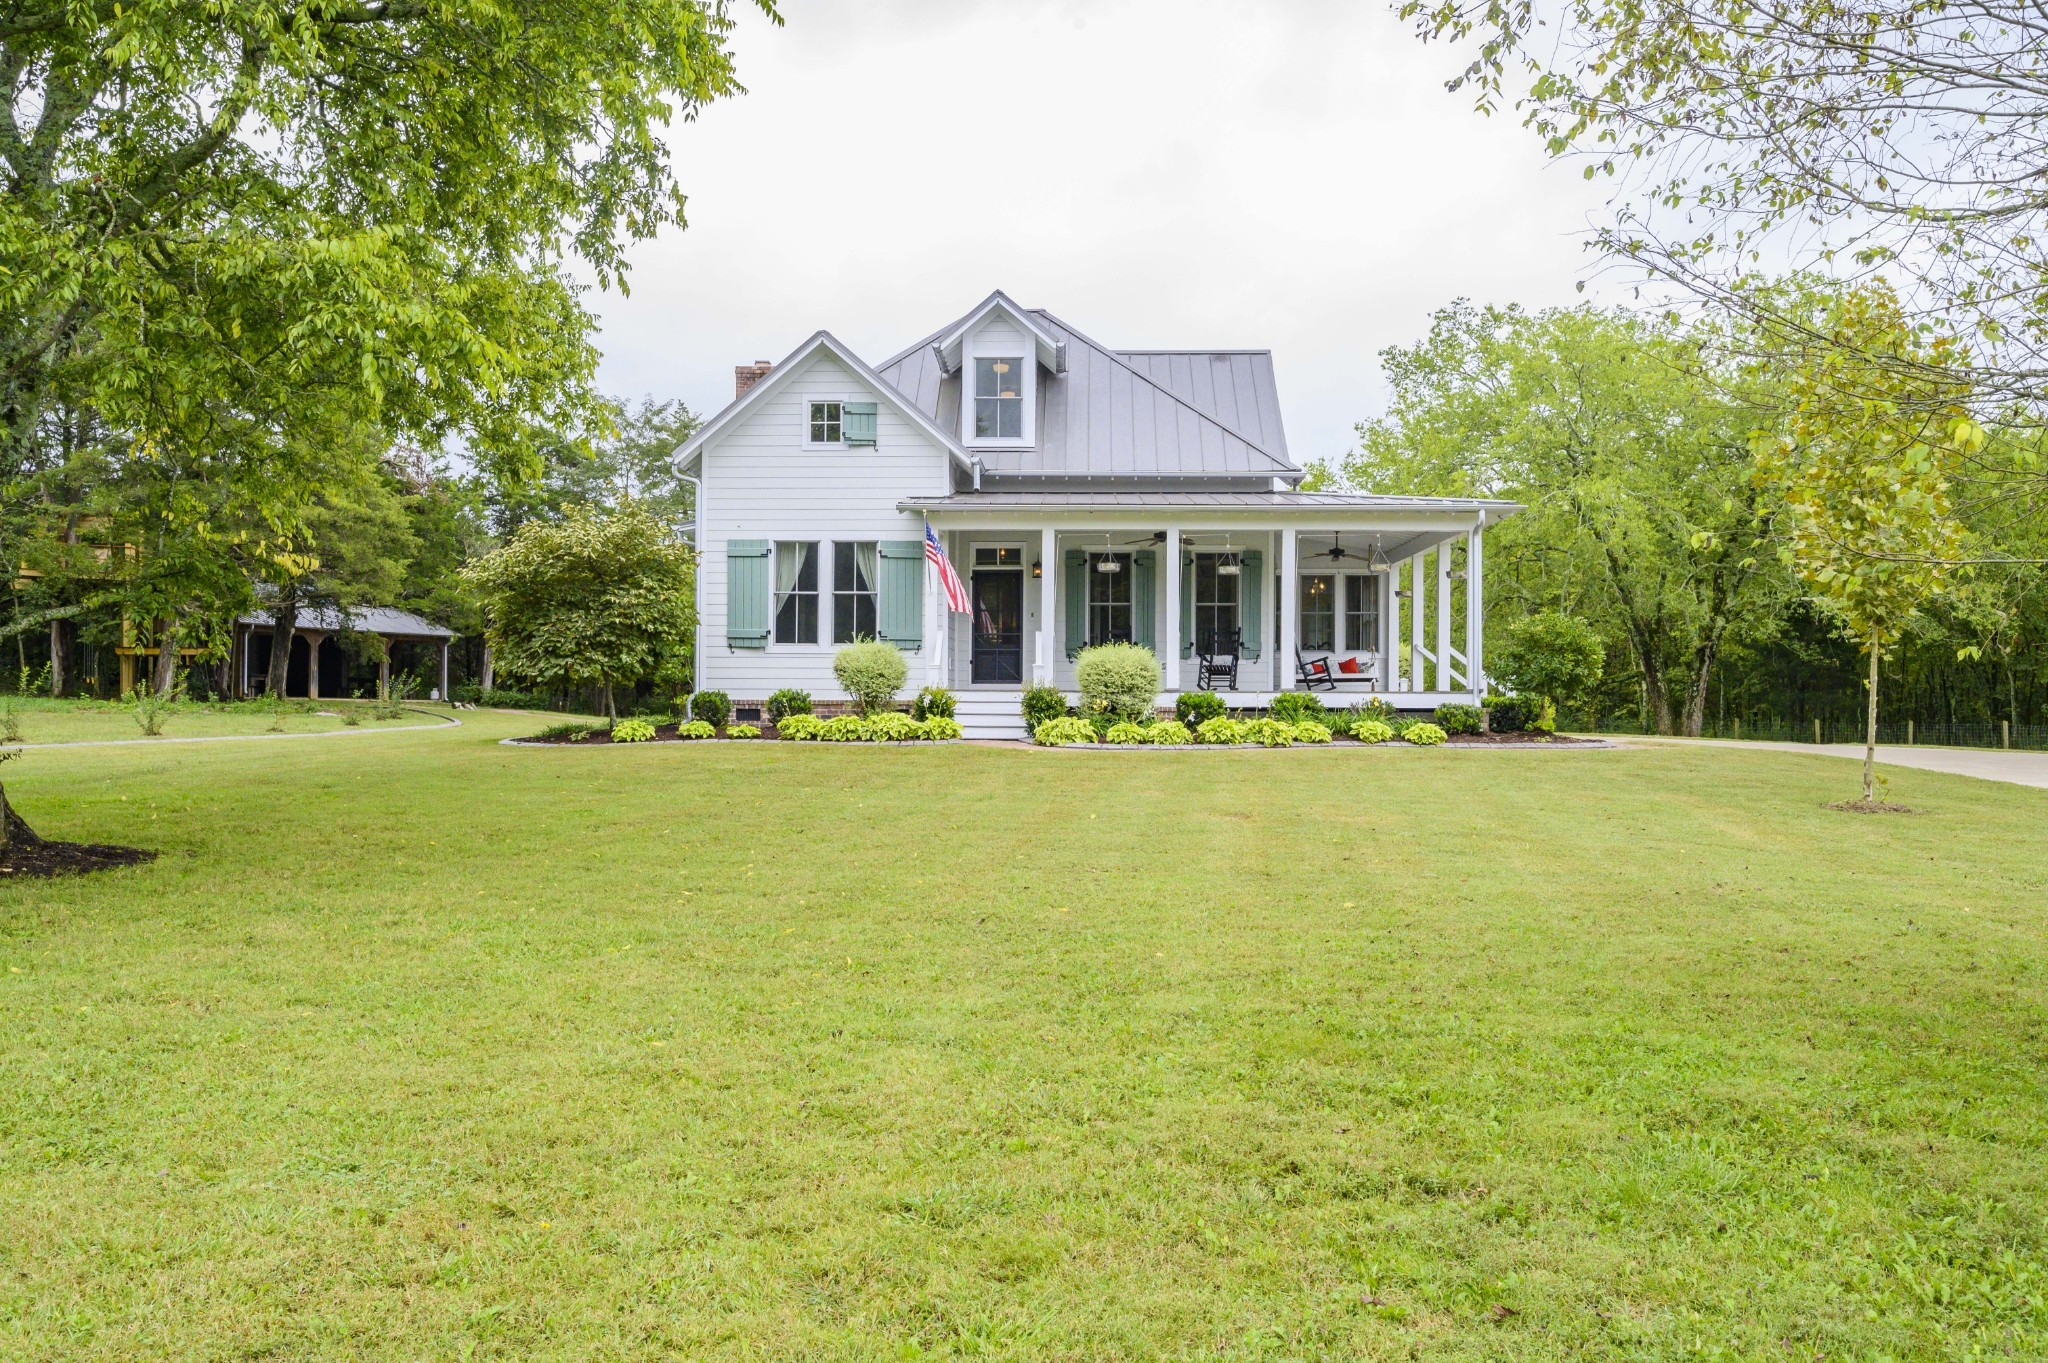 10229 Highway 99 Property Photo - Rockvale, TN real estate listing